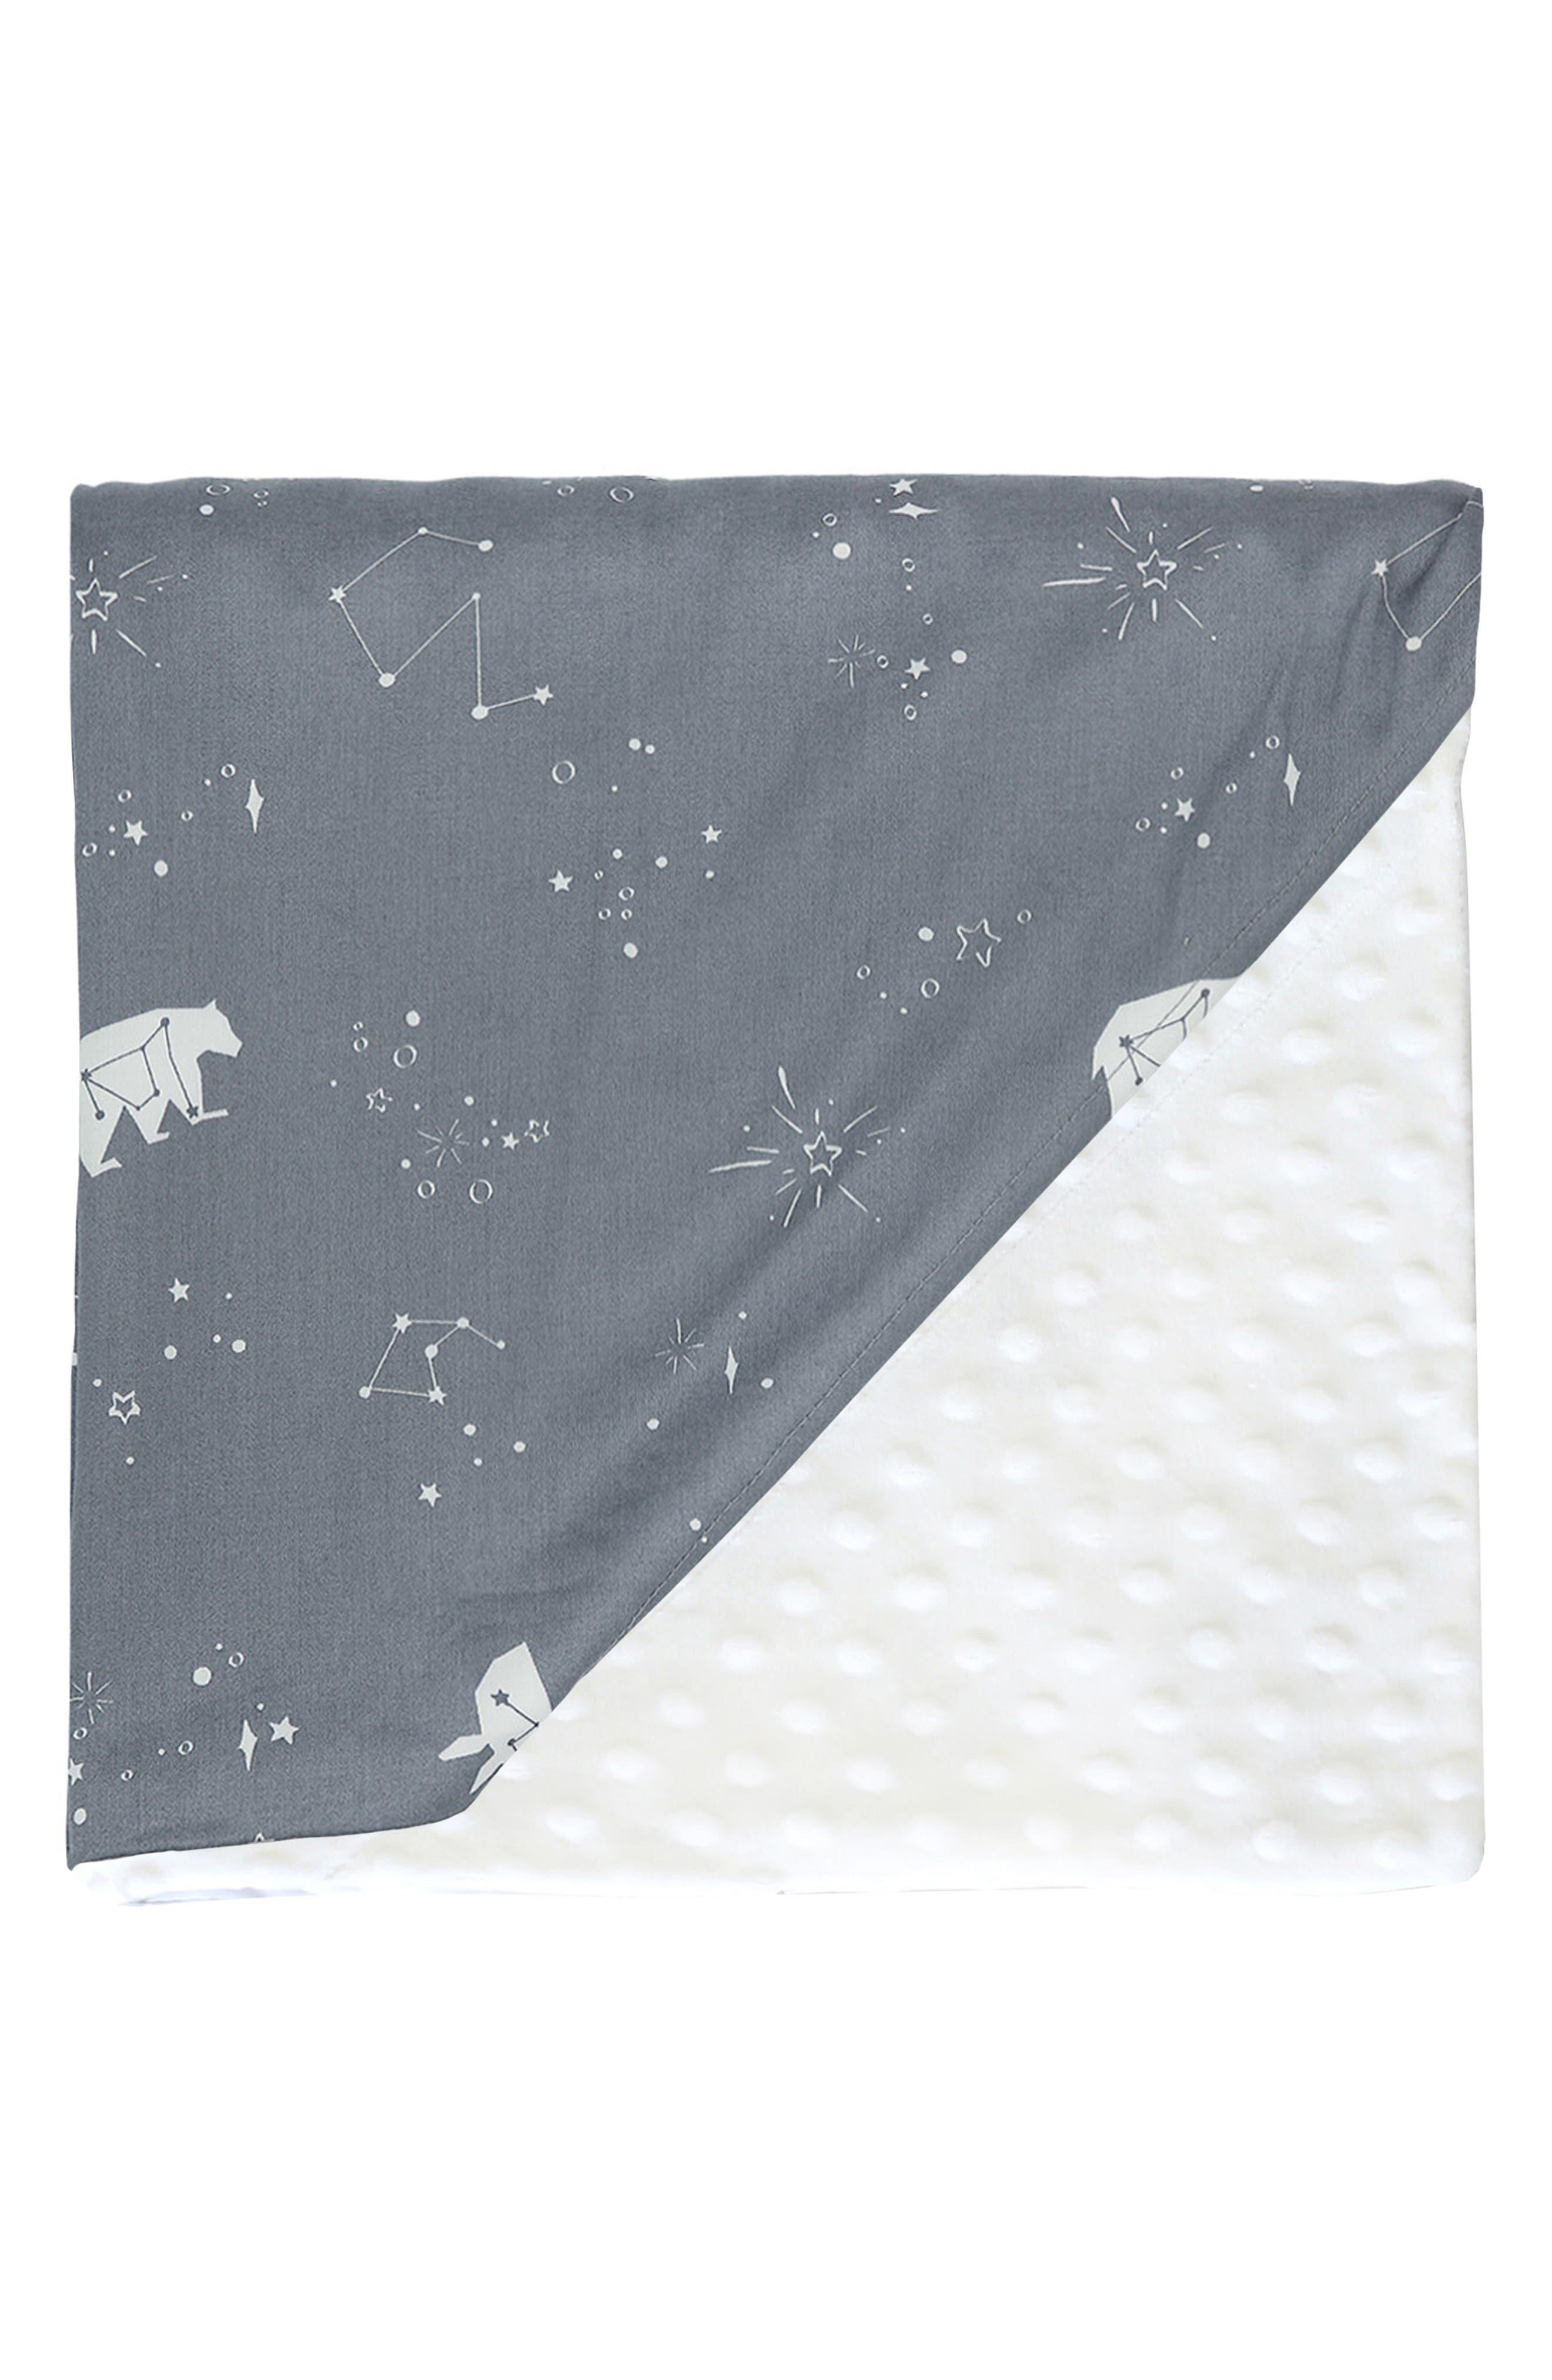 Embossed Minky Baby Blanket,                             Main thumbnail 1, color,                             POLARIS